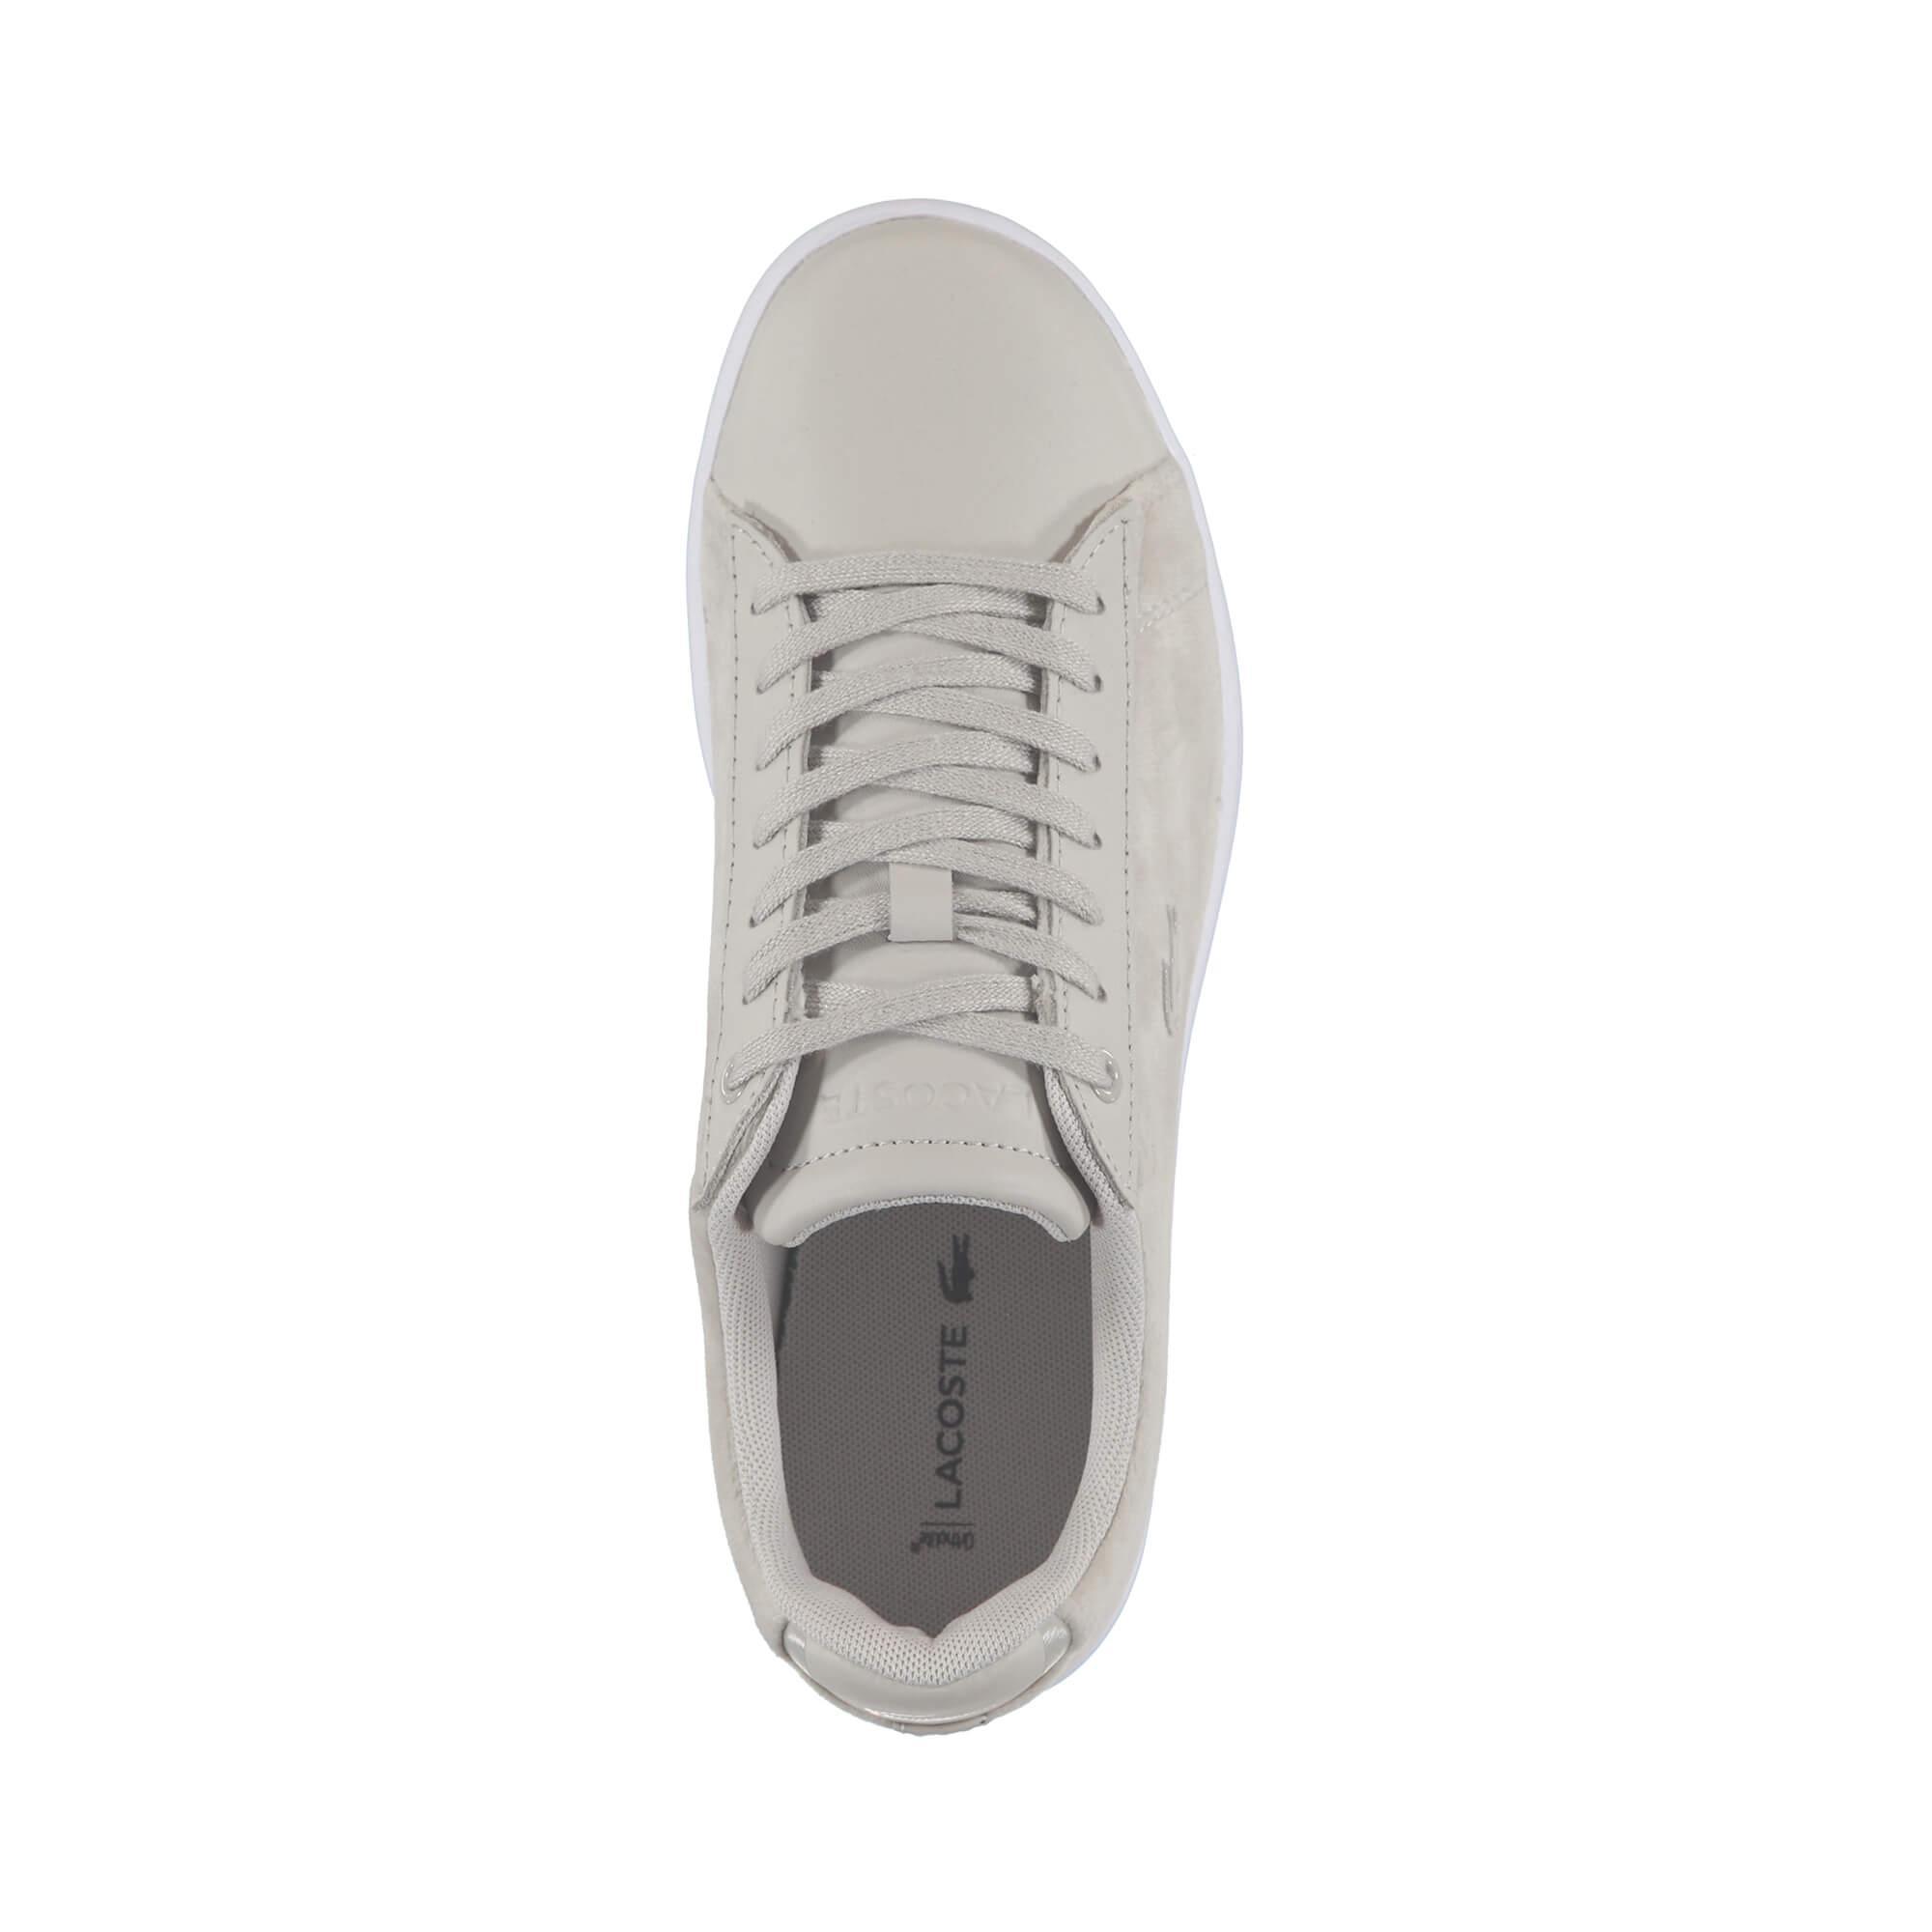 Lacoste Kadın Carnaby Evo 318 8 Gri Sneaker